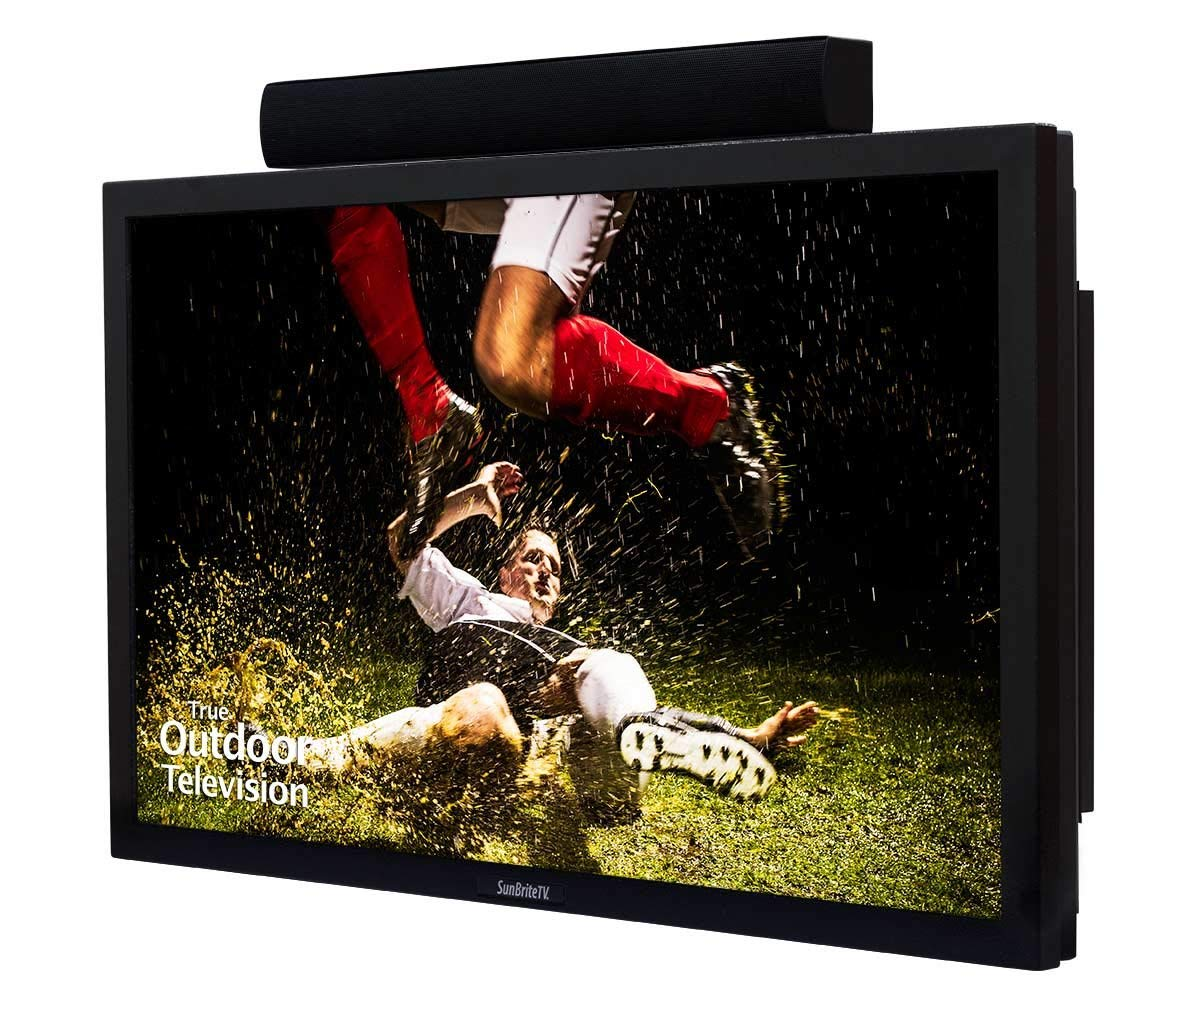 An image of SunBriteTV SB-4217HD-BL 42-Inch FHD LED Outdoor TV